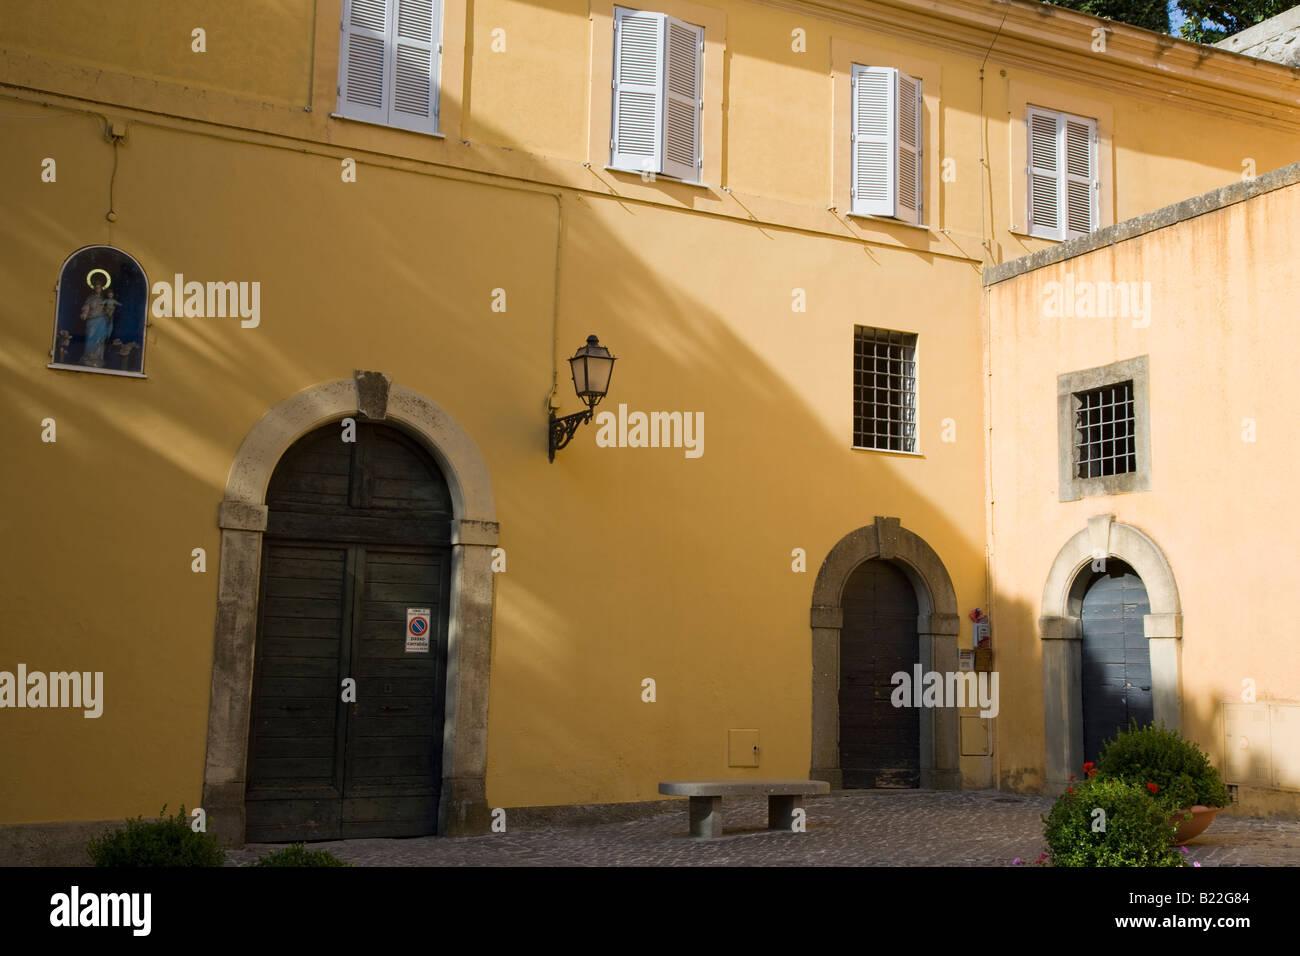 Papal summer quarters, Castelgandolfo, Italy - Stock Image